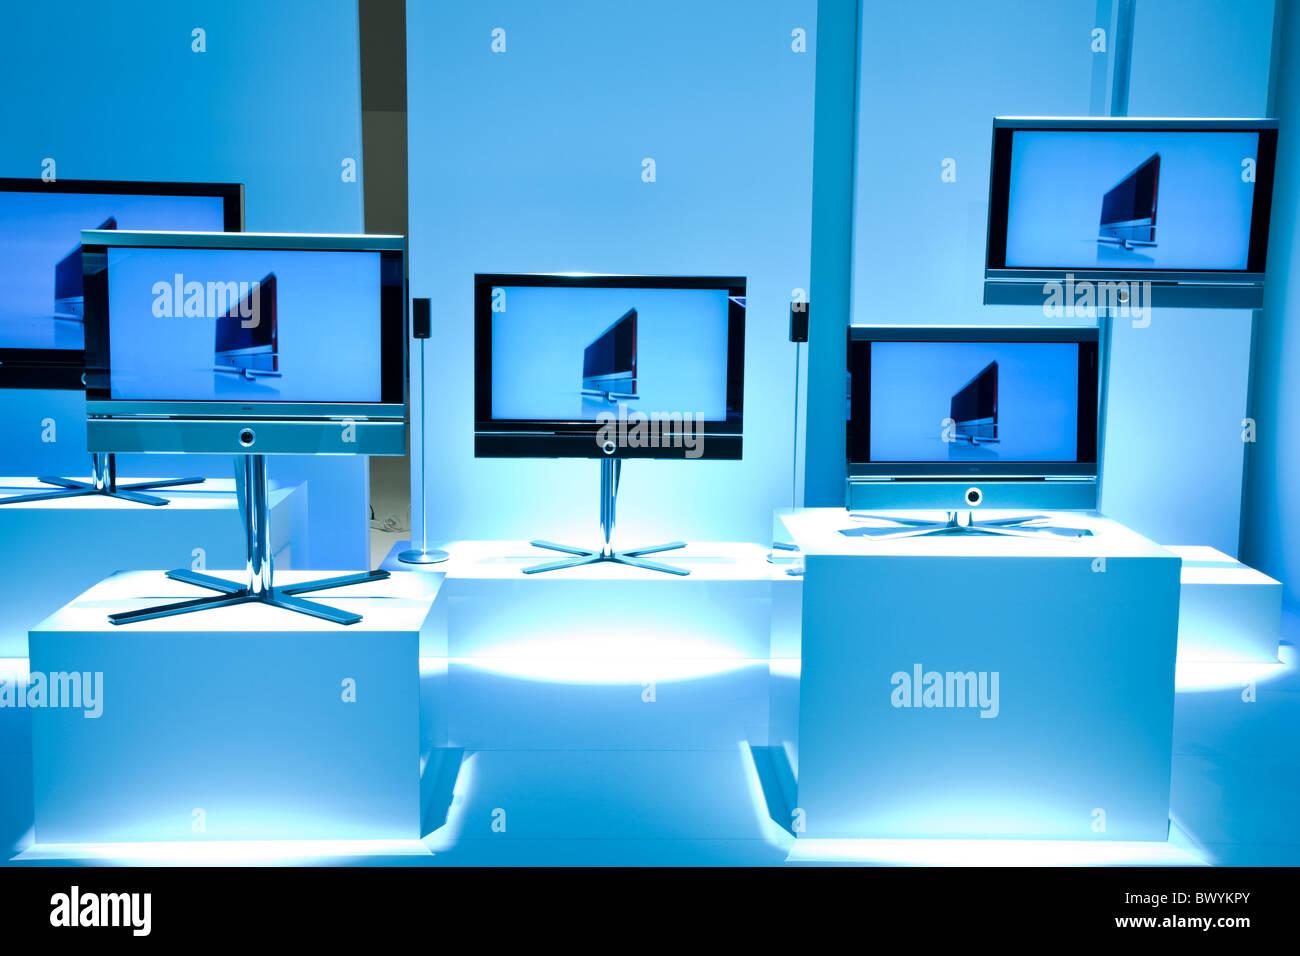 flat lcd tv screens, hd digital electronic hdtv high